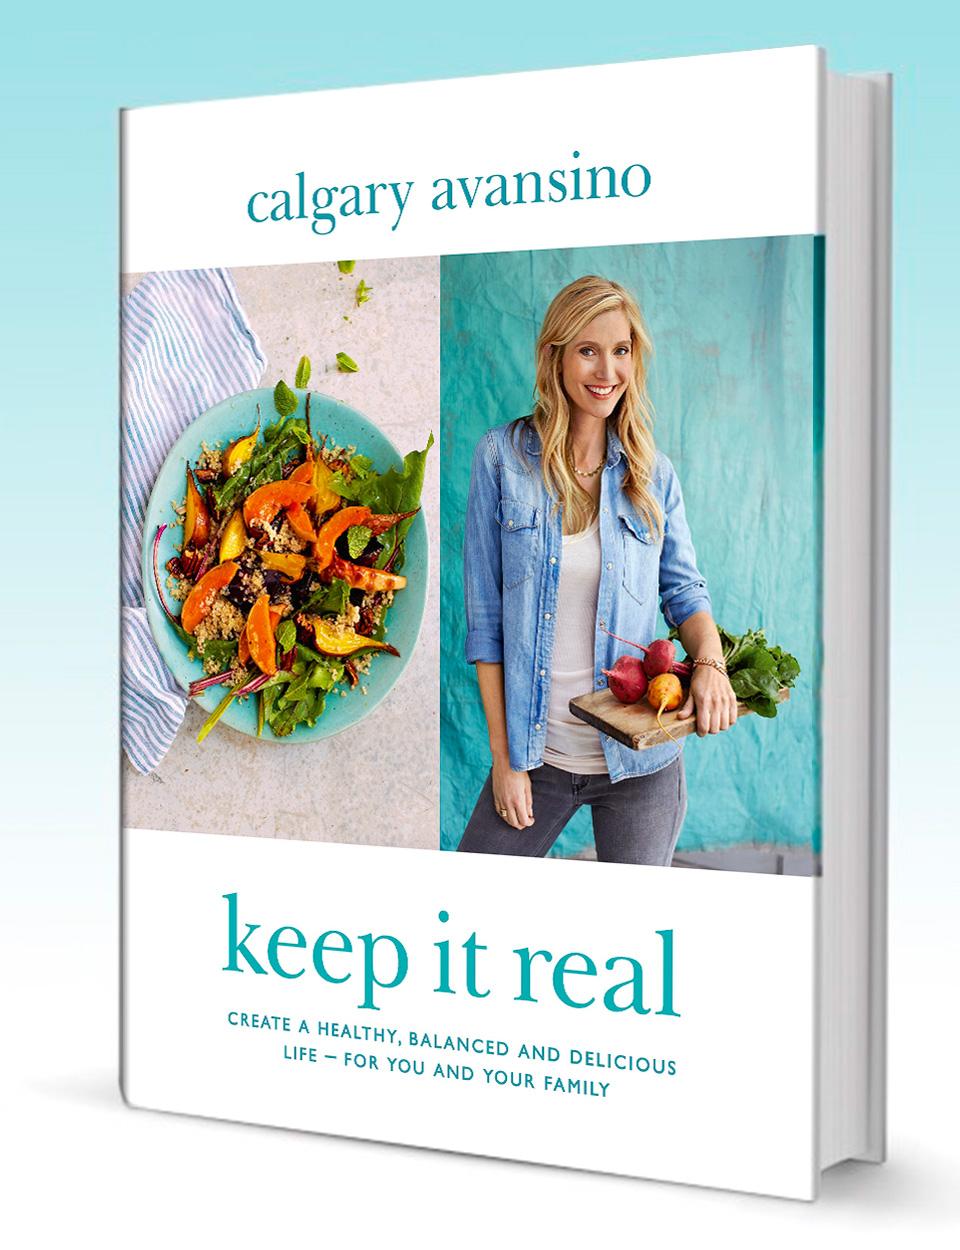 Calgary Avansino's book Keep It Real